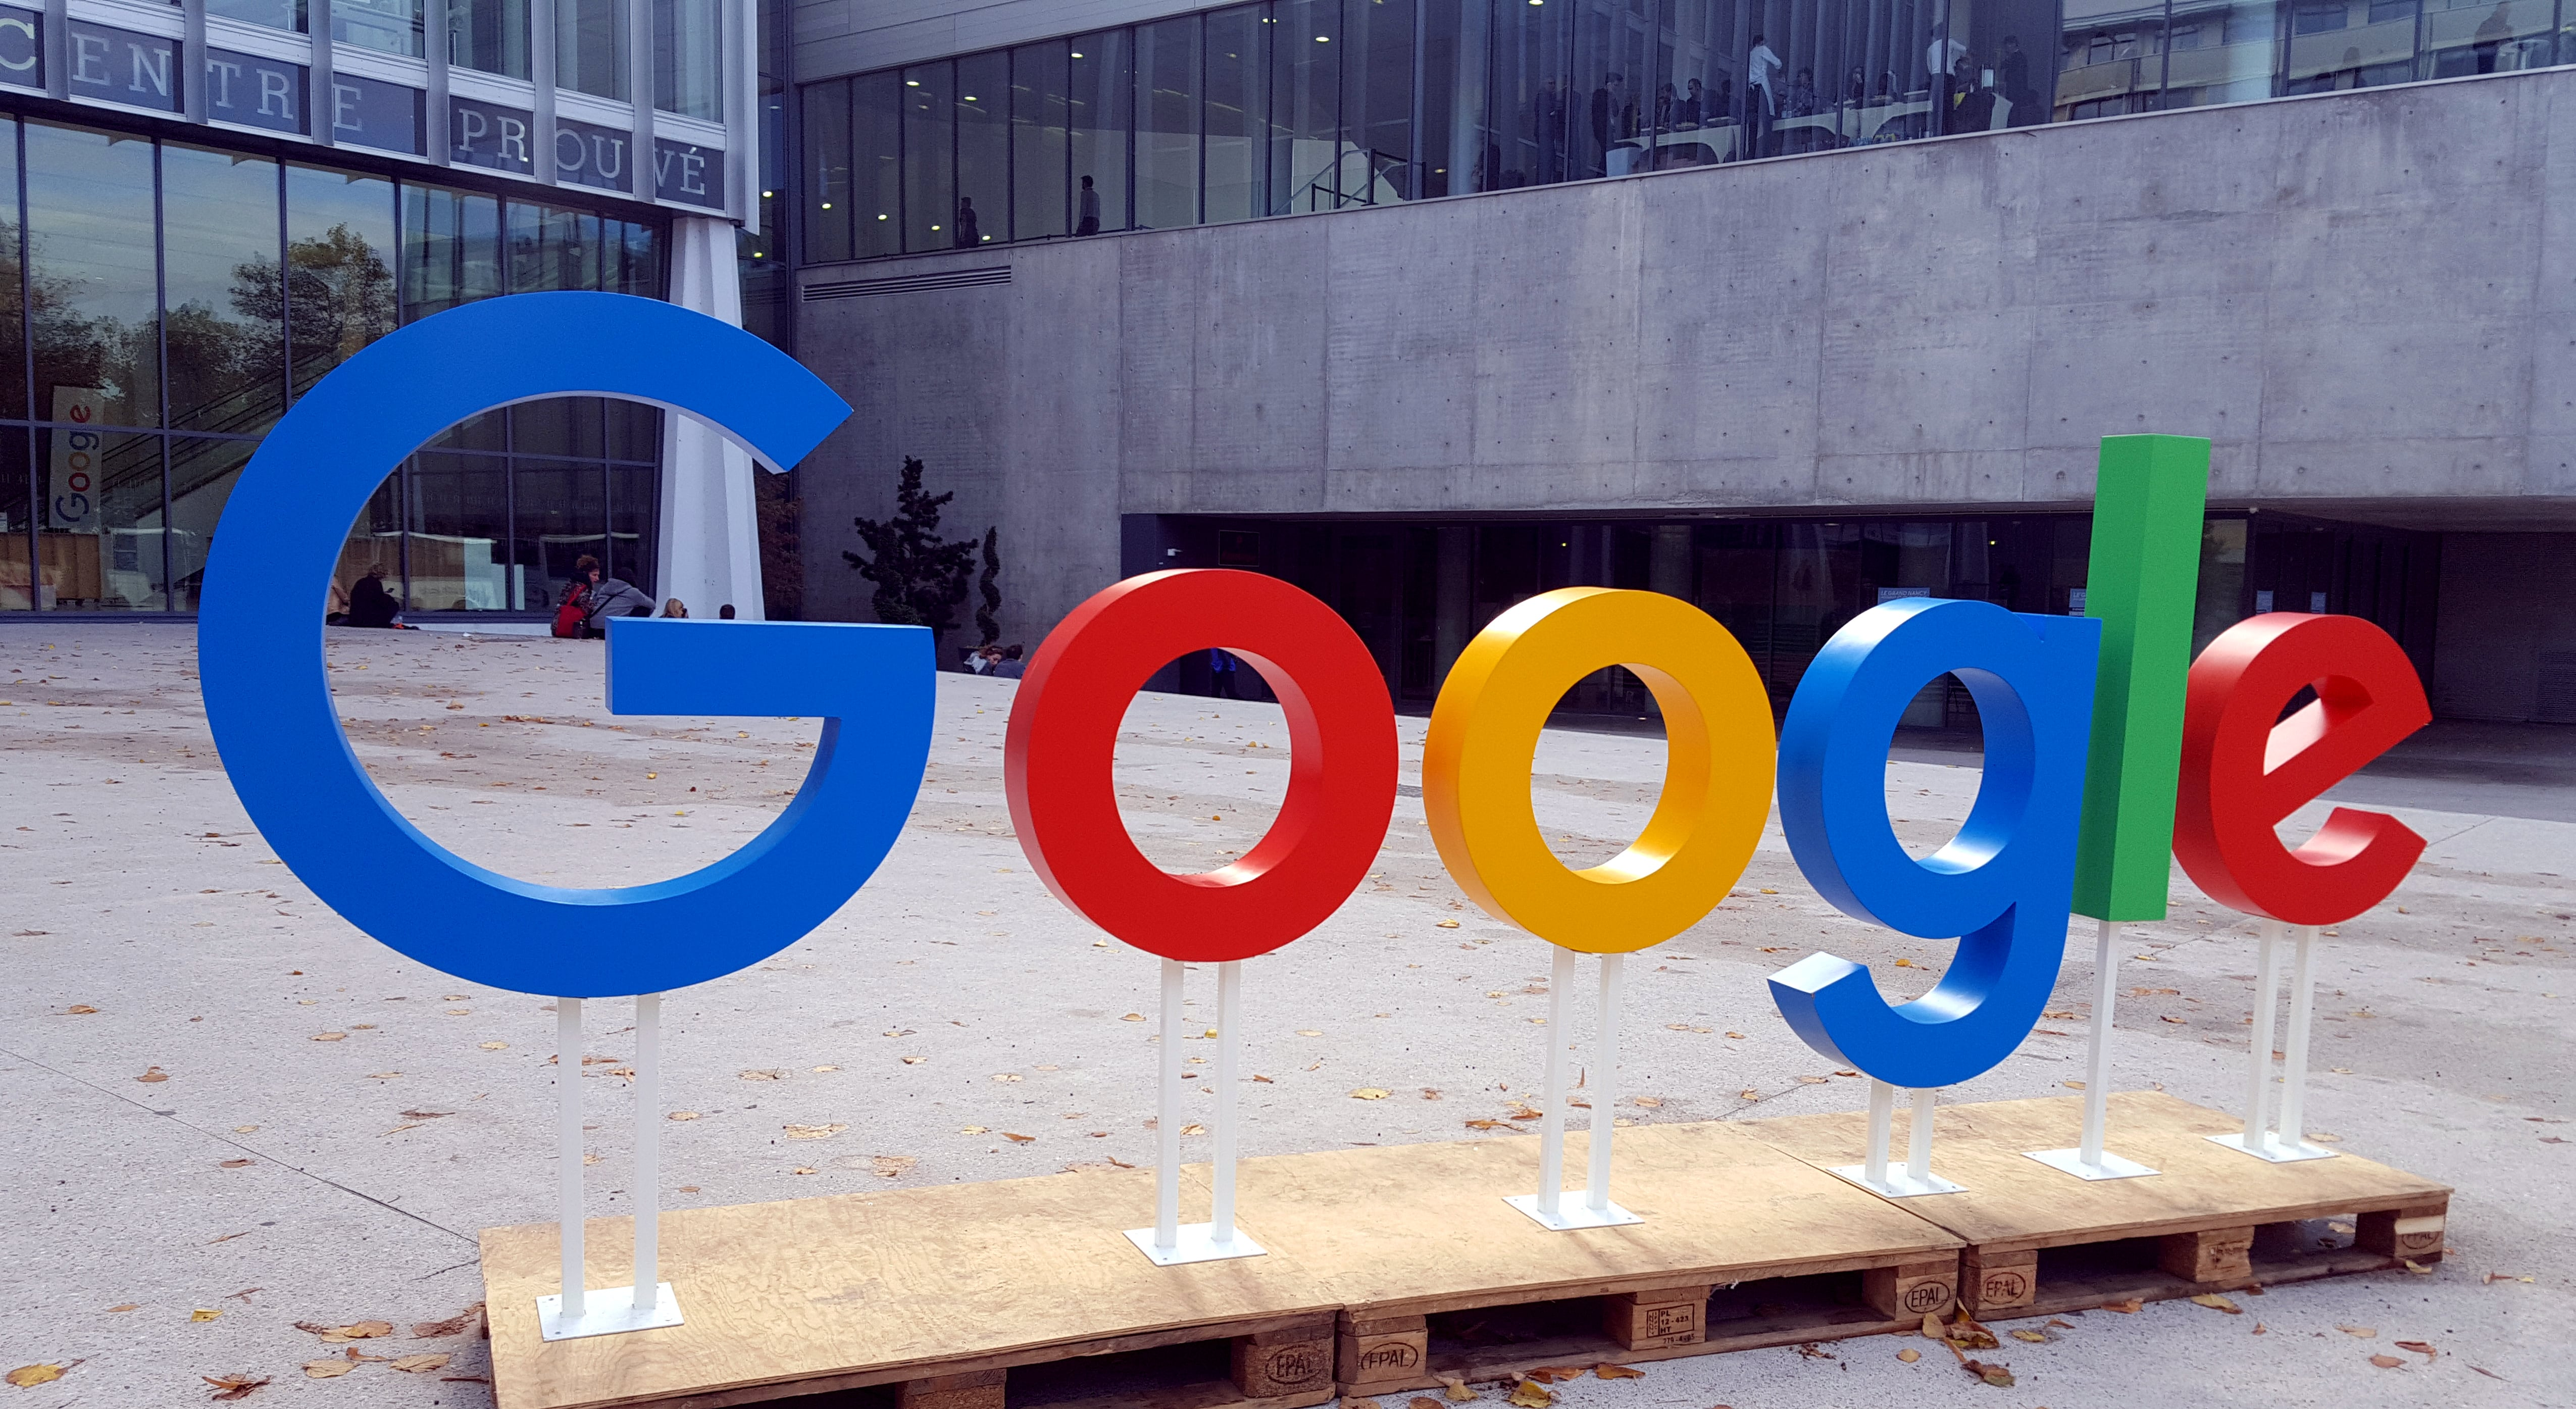 Rencontre google rencontre gay maroc rencontres avis